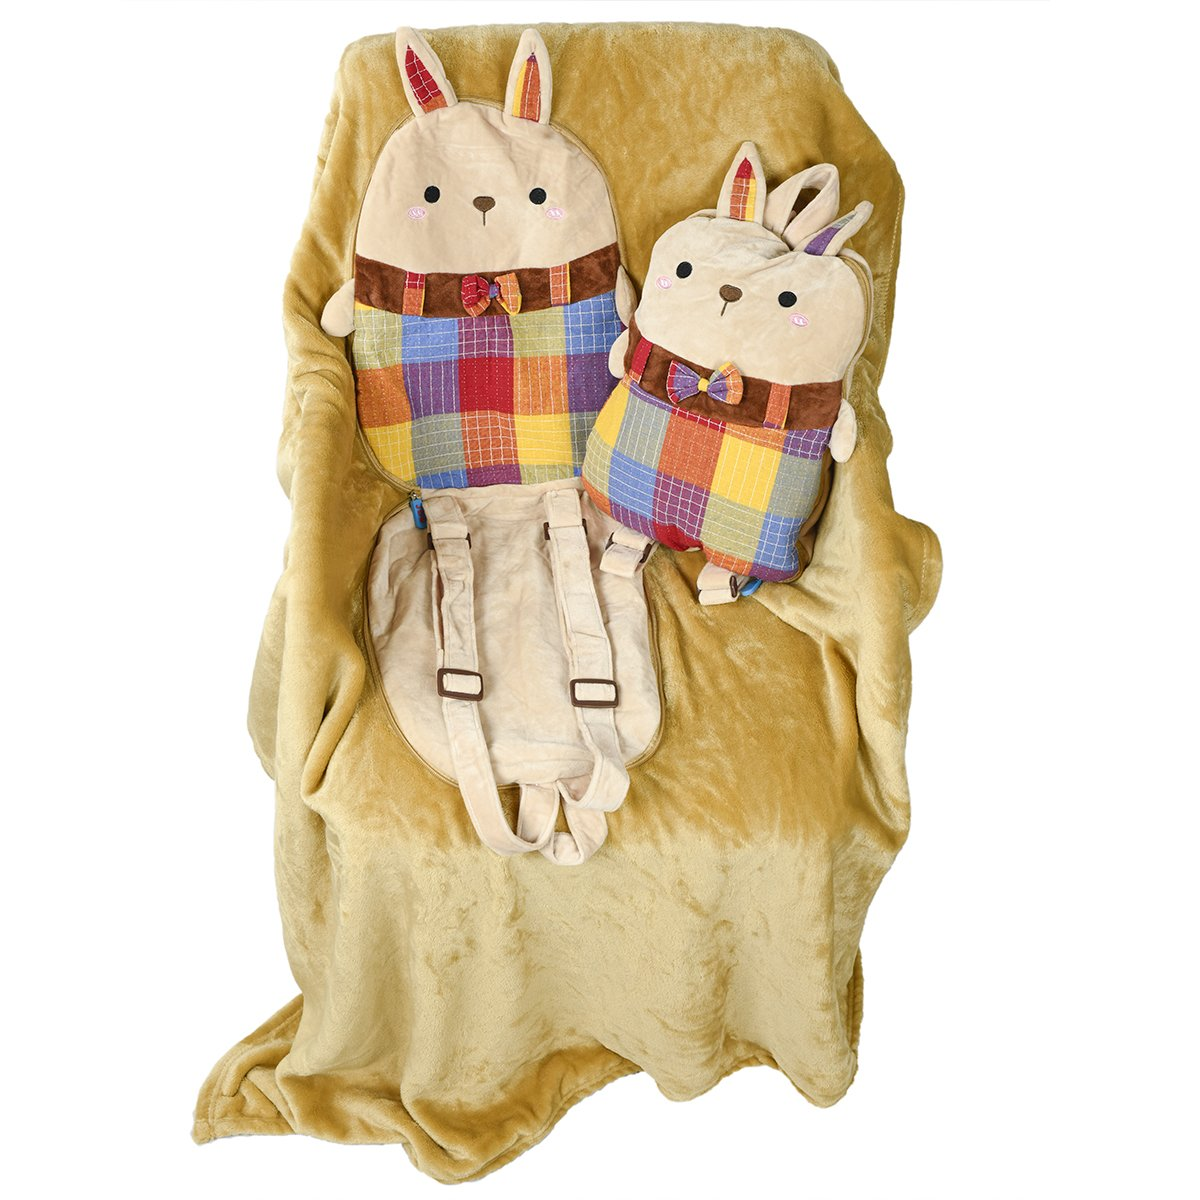 Plush Packable Portable Back Buddy Pillow for Kids Senmiya Bunny Stuffed Animal Cute Throw Blanket Fuzzy Cuddle Pillow Pet Beige Rabbit Travel Nap Blanket